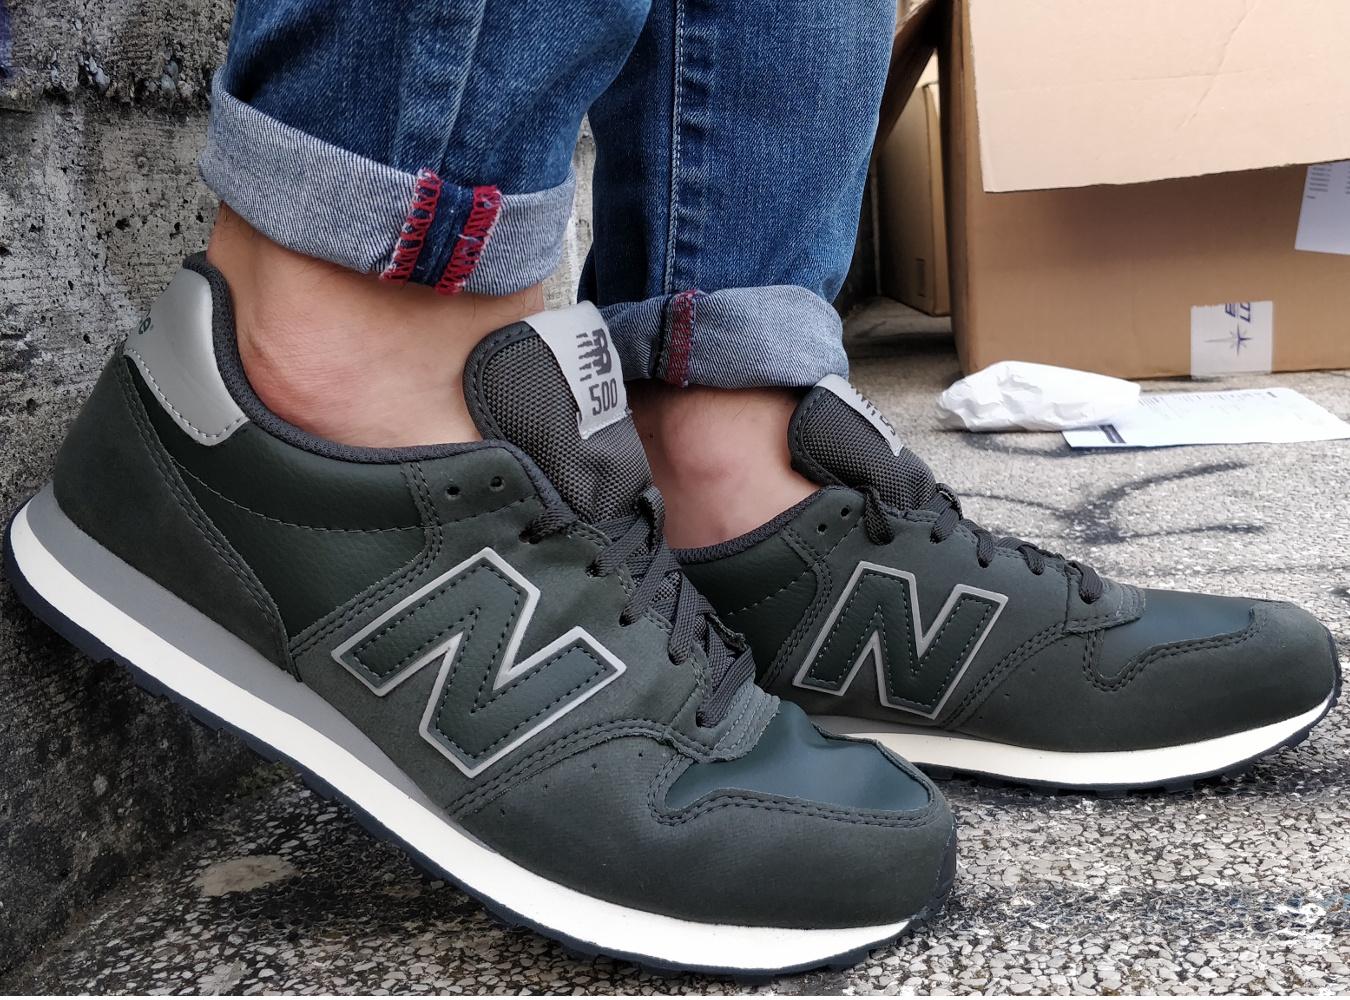 New Balance GM 500 Sport Schuhe Sneakers Boots Shoe Lifestyle sportswear grün